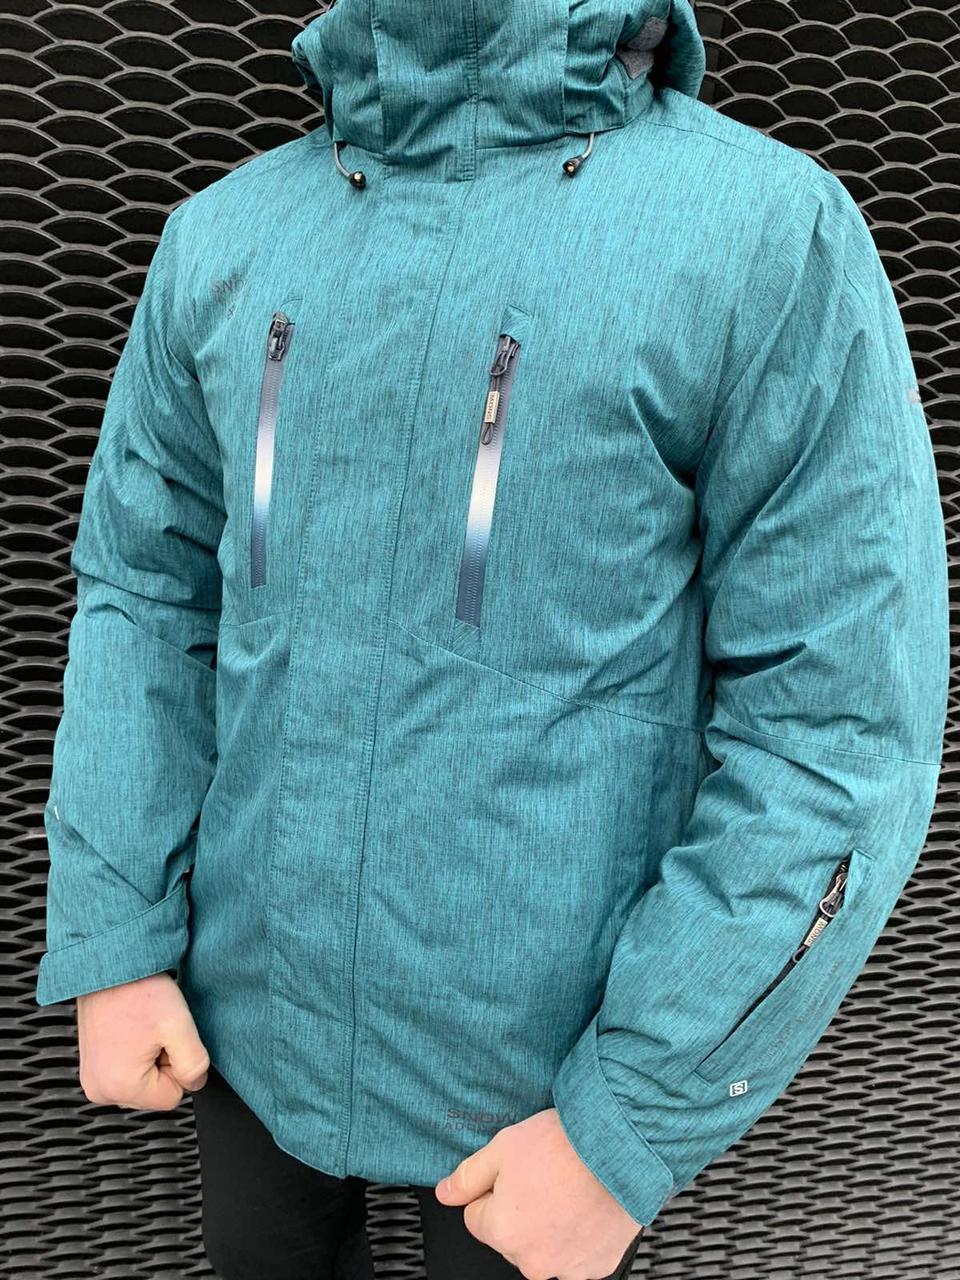 Мужская горнолыжная куртка Snow Headqurarter морская волна